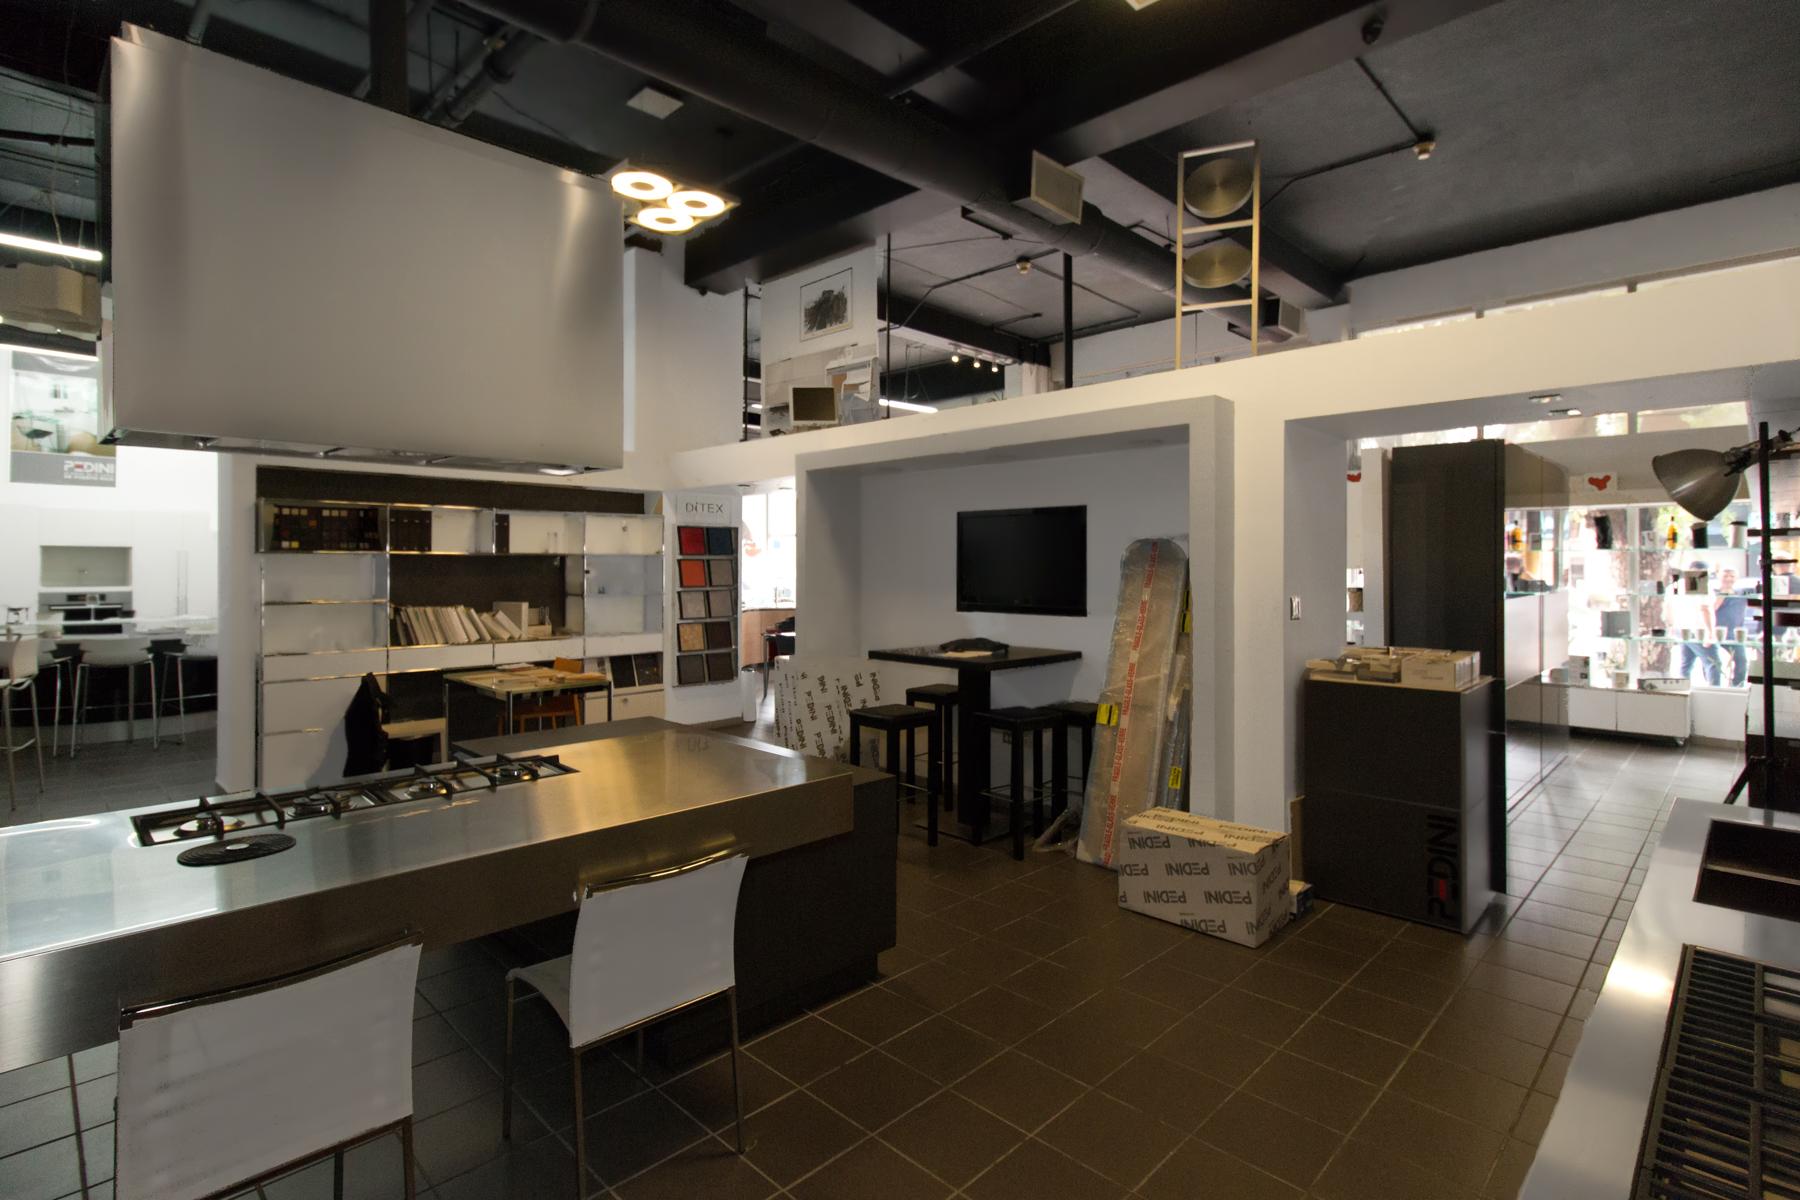 Additional photo for property listing at De Diego Street Front Space 316 Avenida de Diego Suites 101, 102 San Juan, Puerto Rico 00907 Puerto Rico